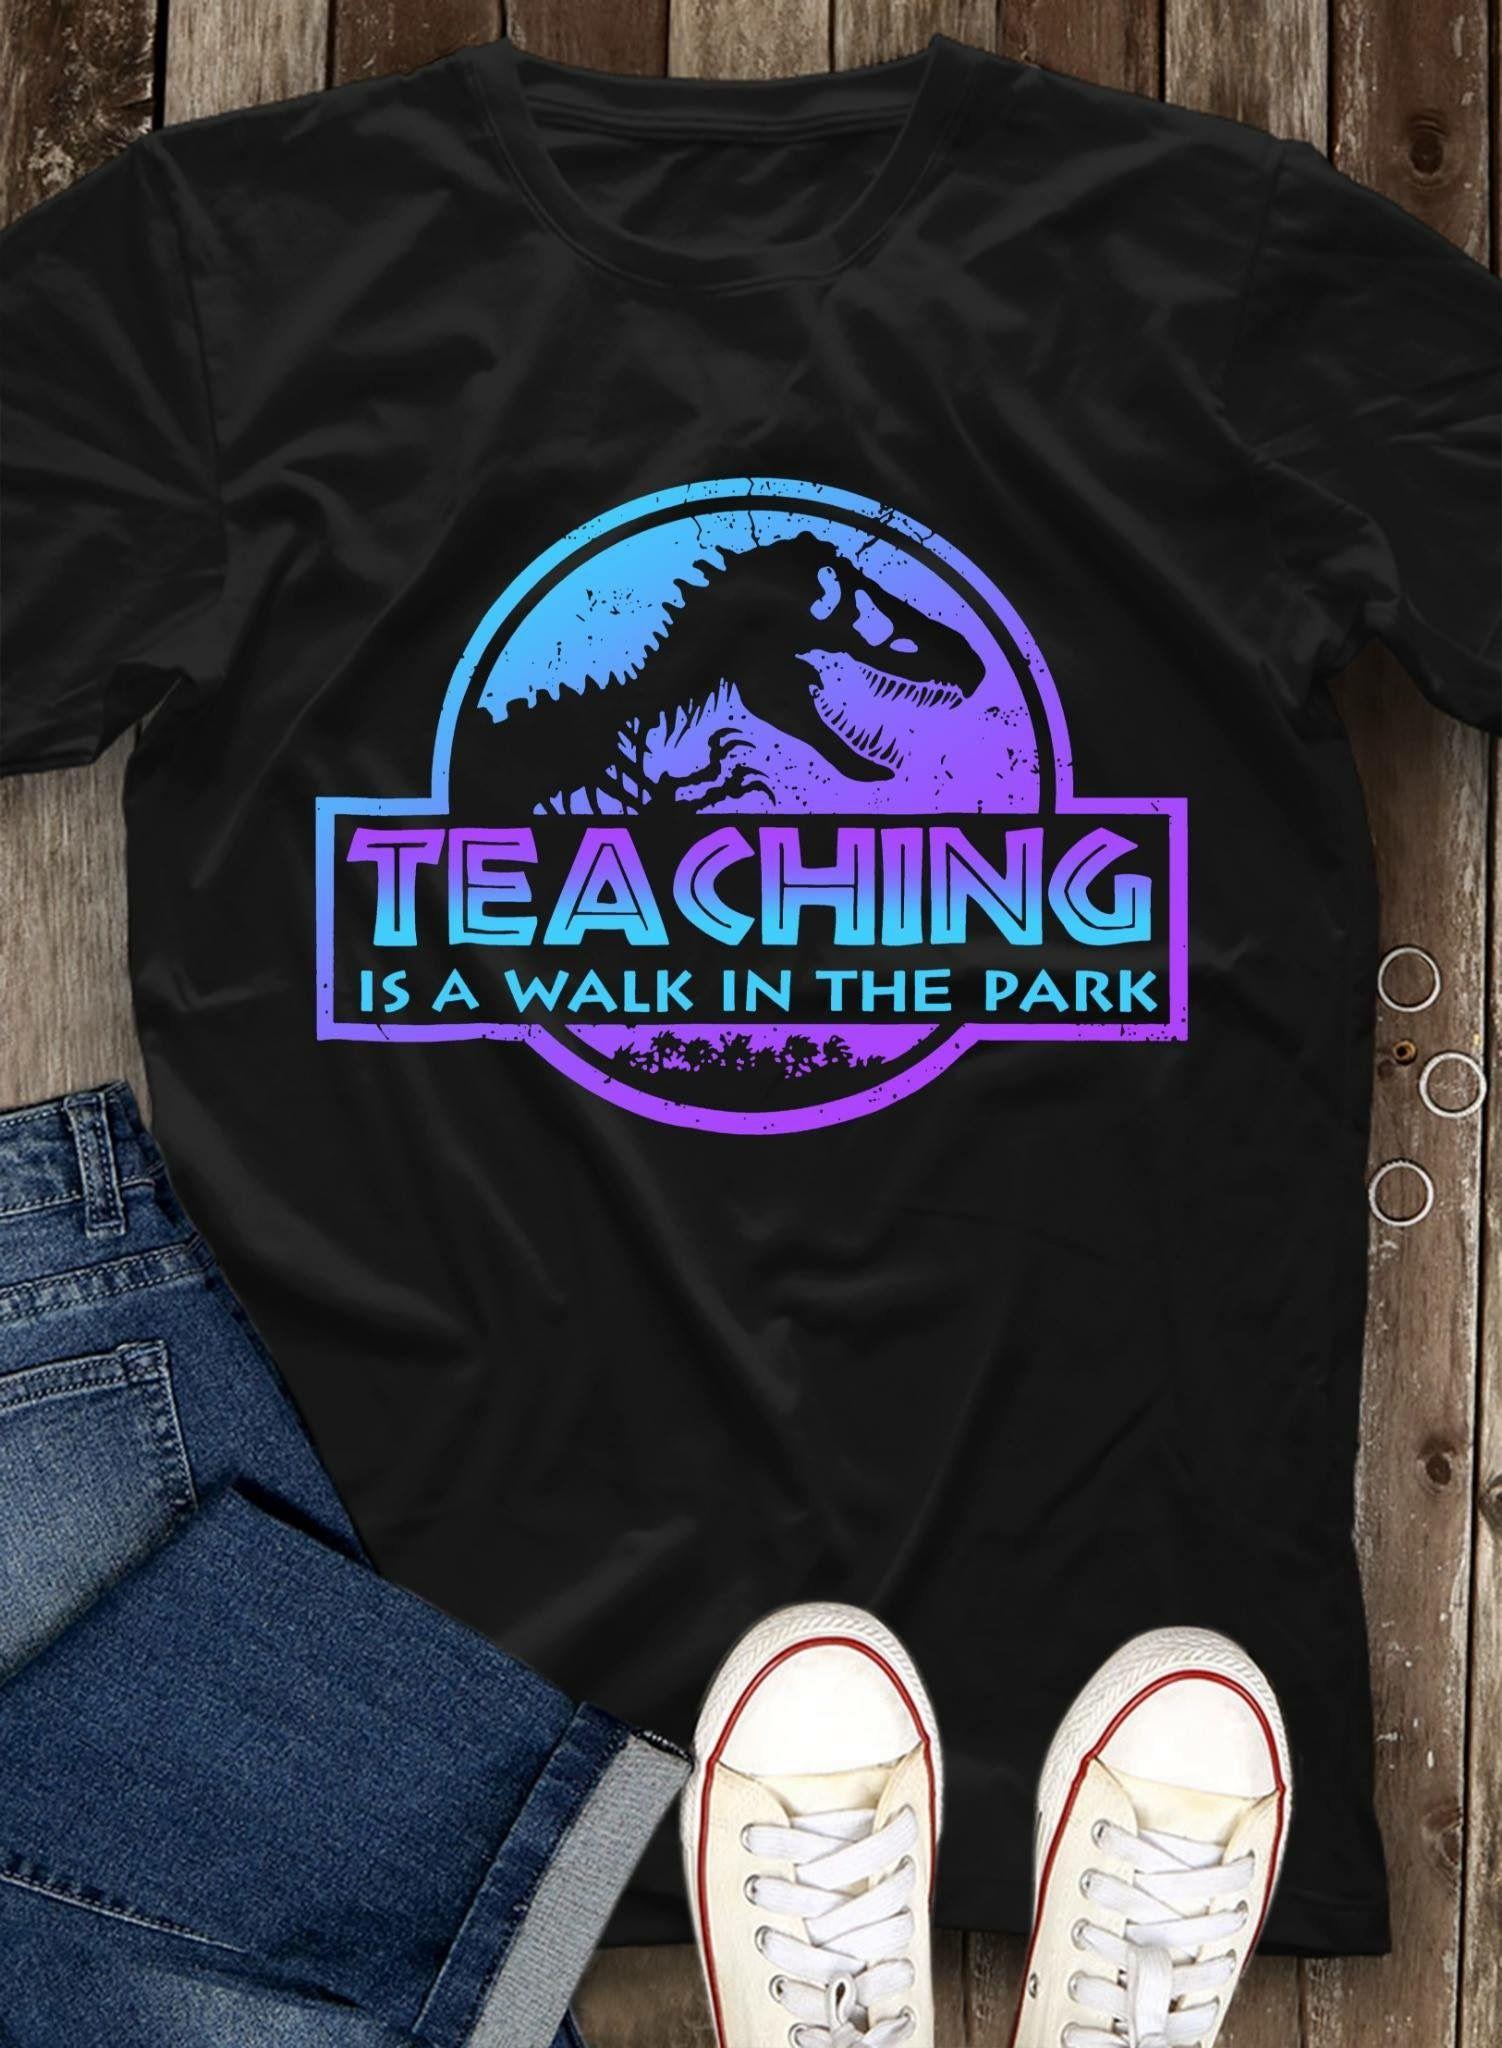 9a001857c Jurassic Park Themed Teacher T-shirt   Jurassic Park Room ...